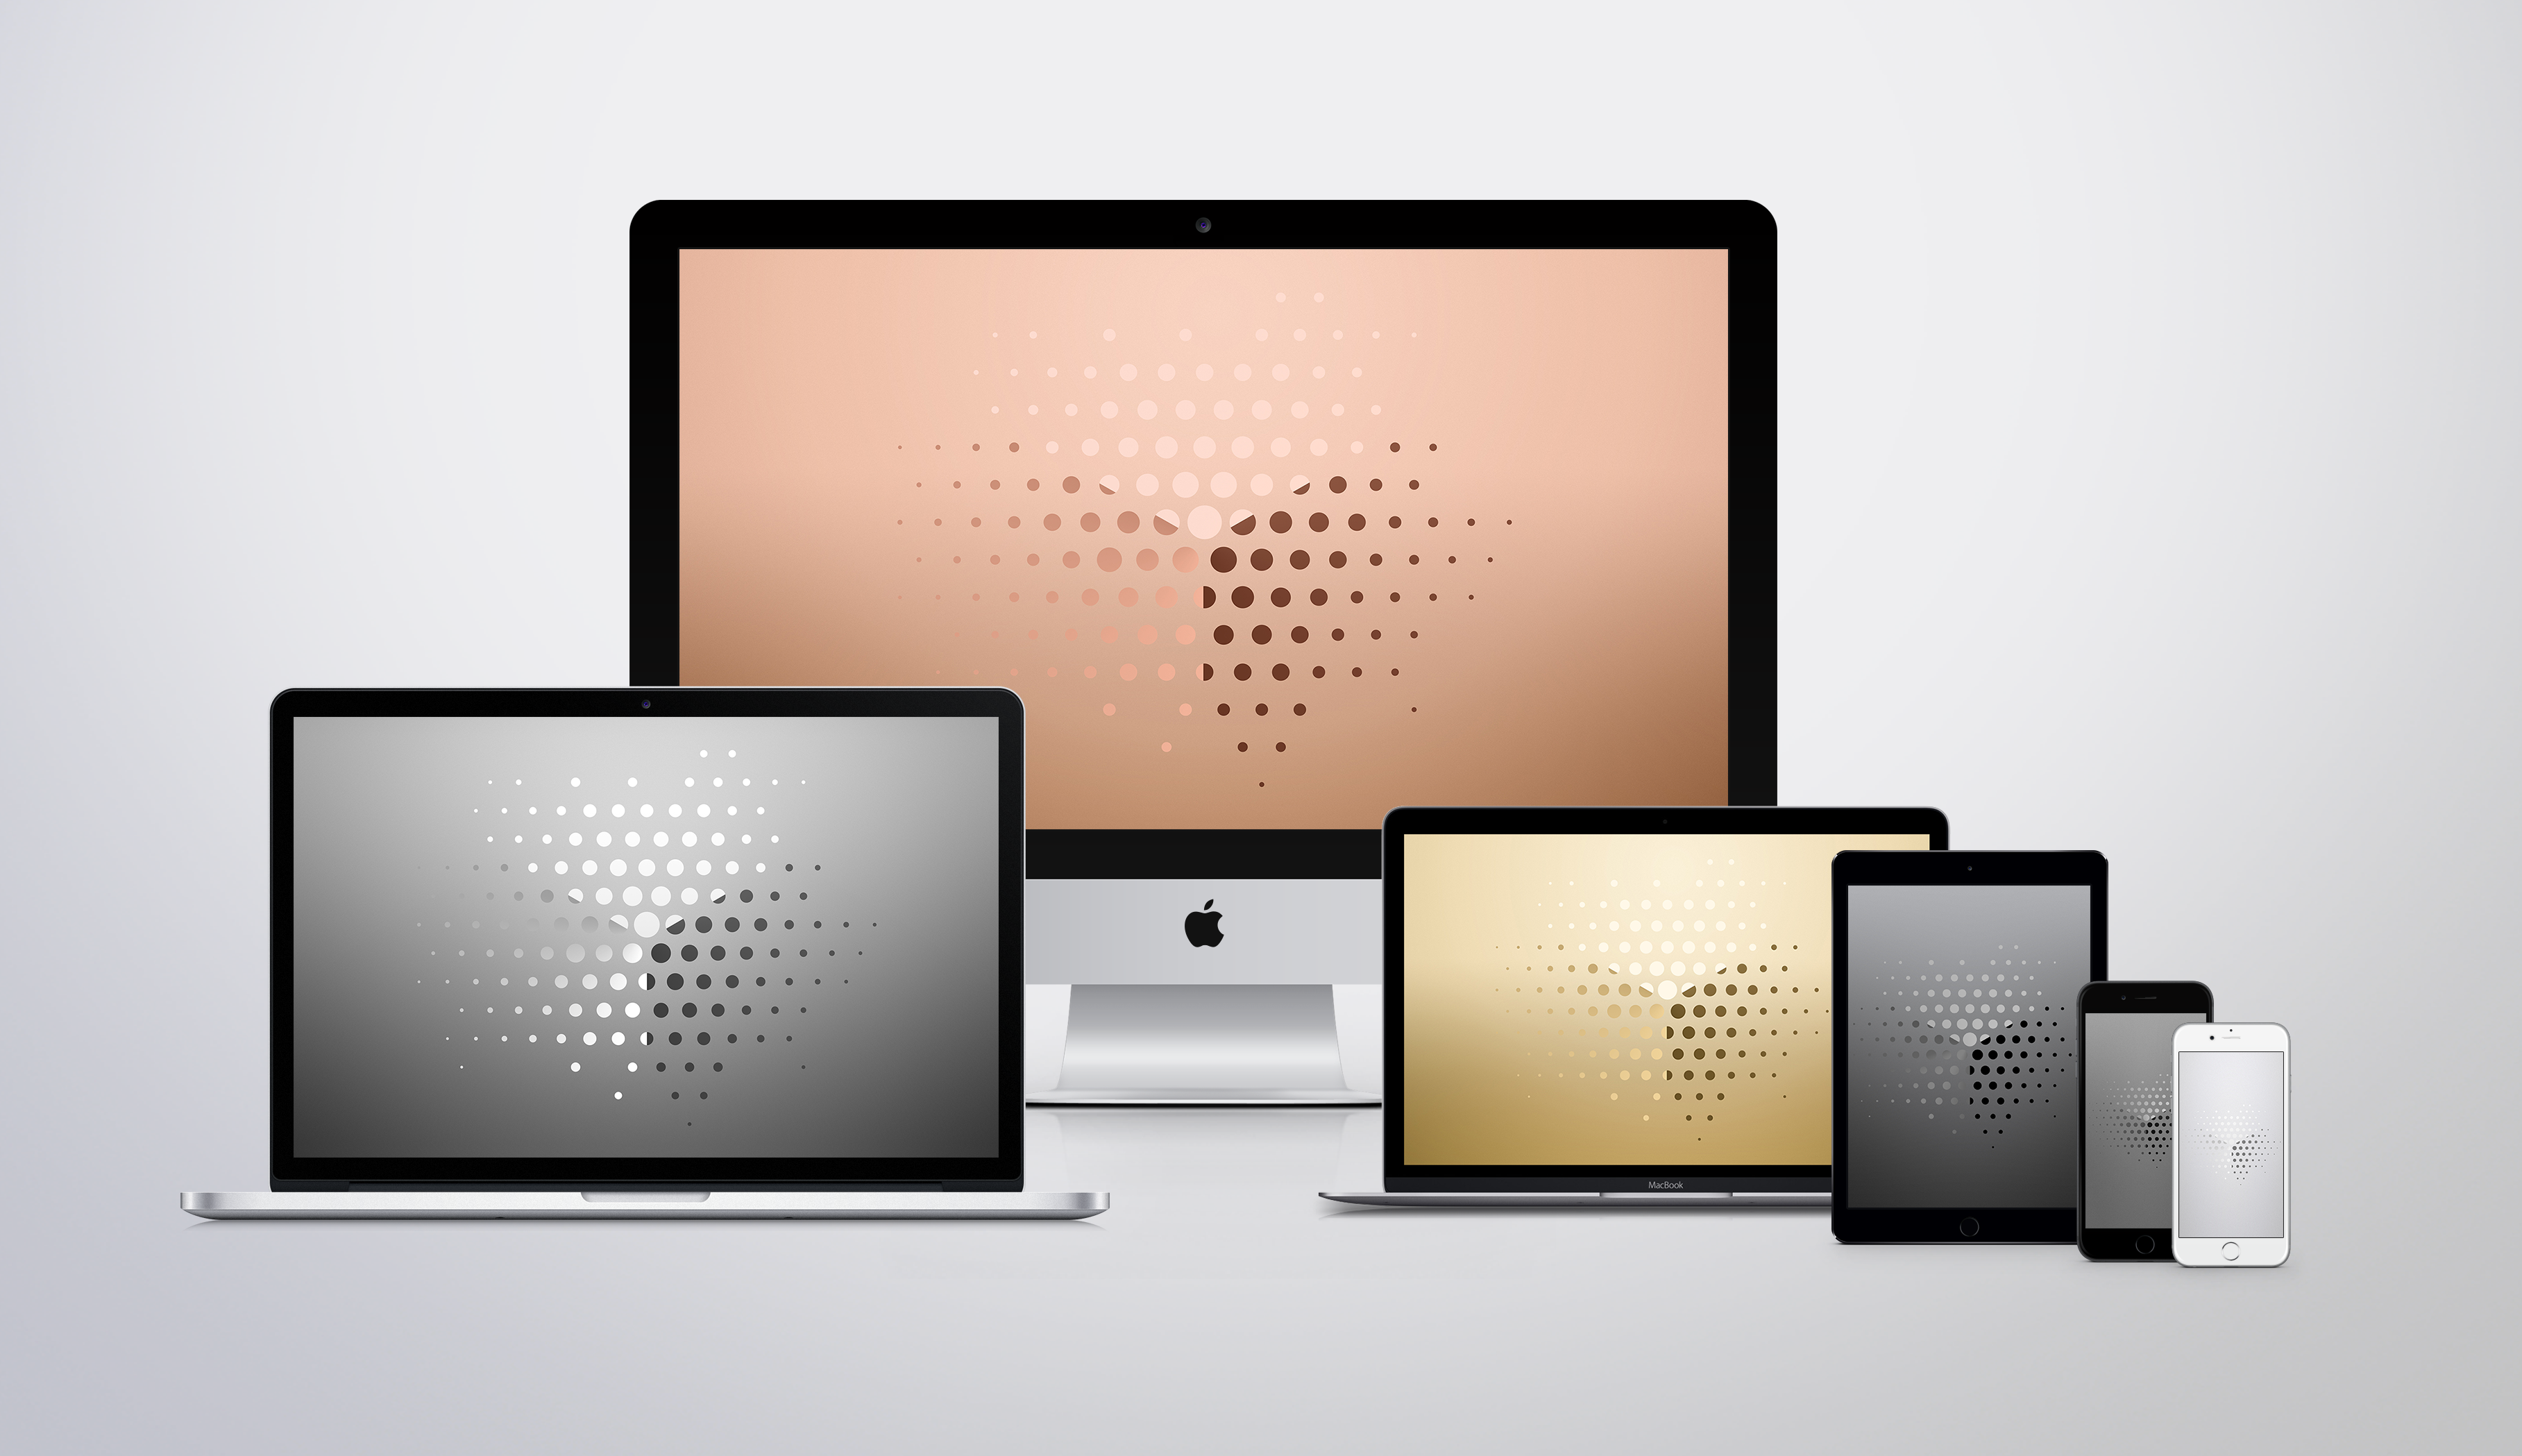 Apple Watch App Wallpaper Set by JasonZigrino on DeviantArt